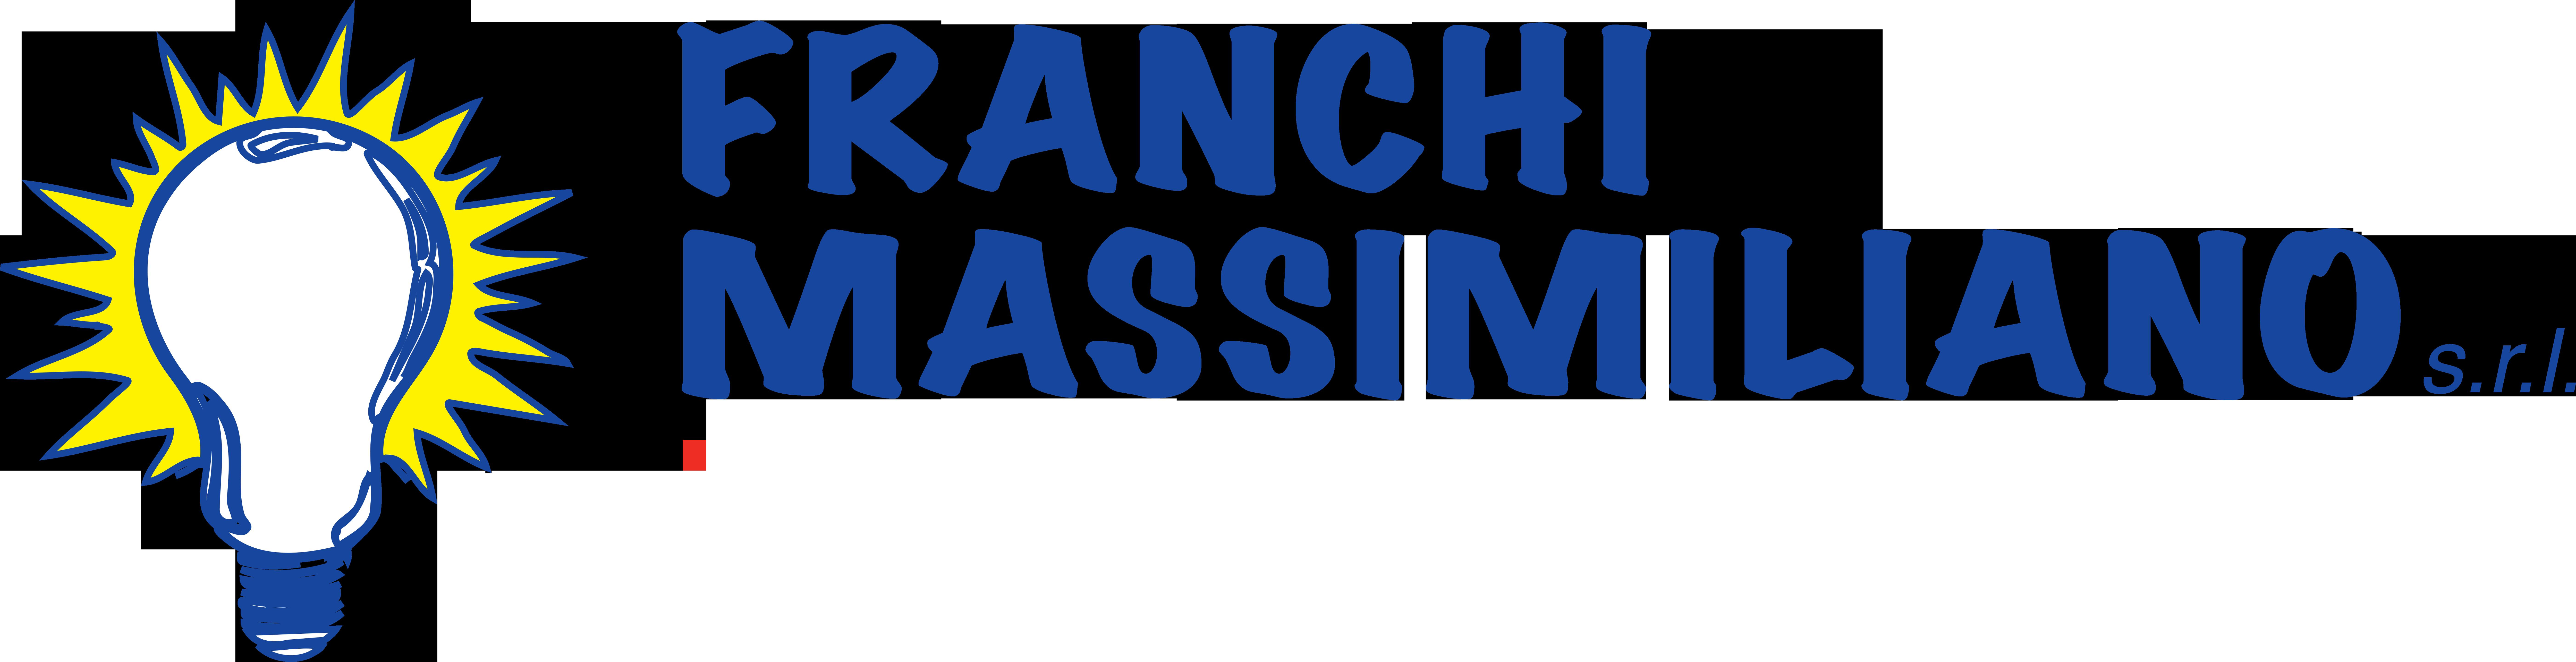 Franchi Massimiliano